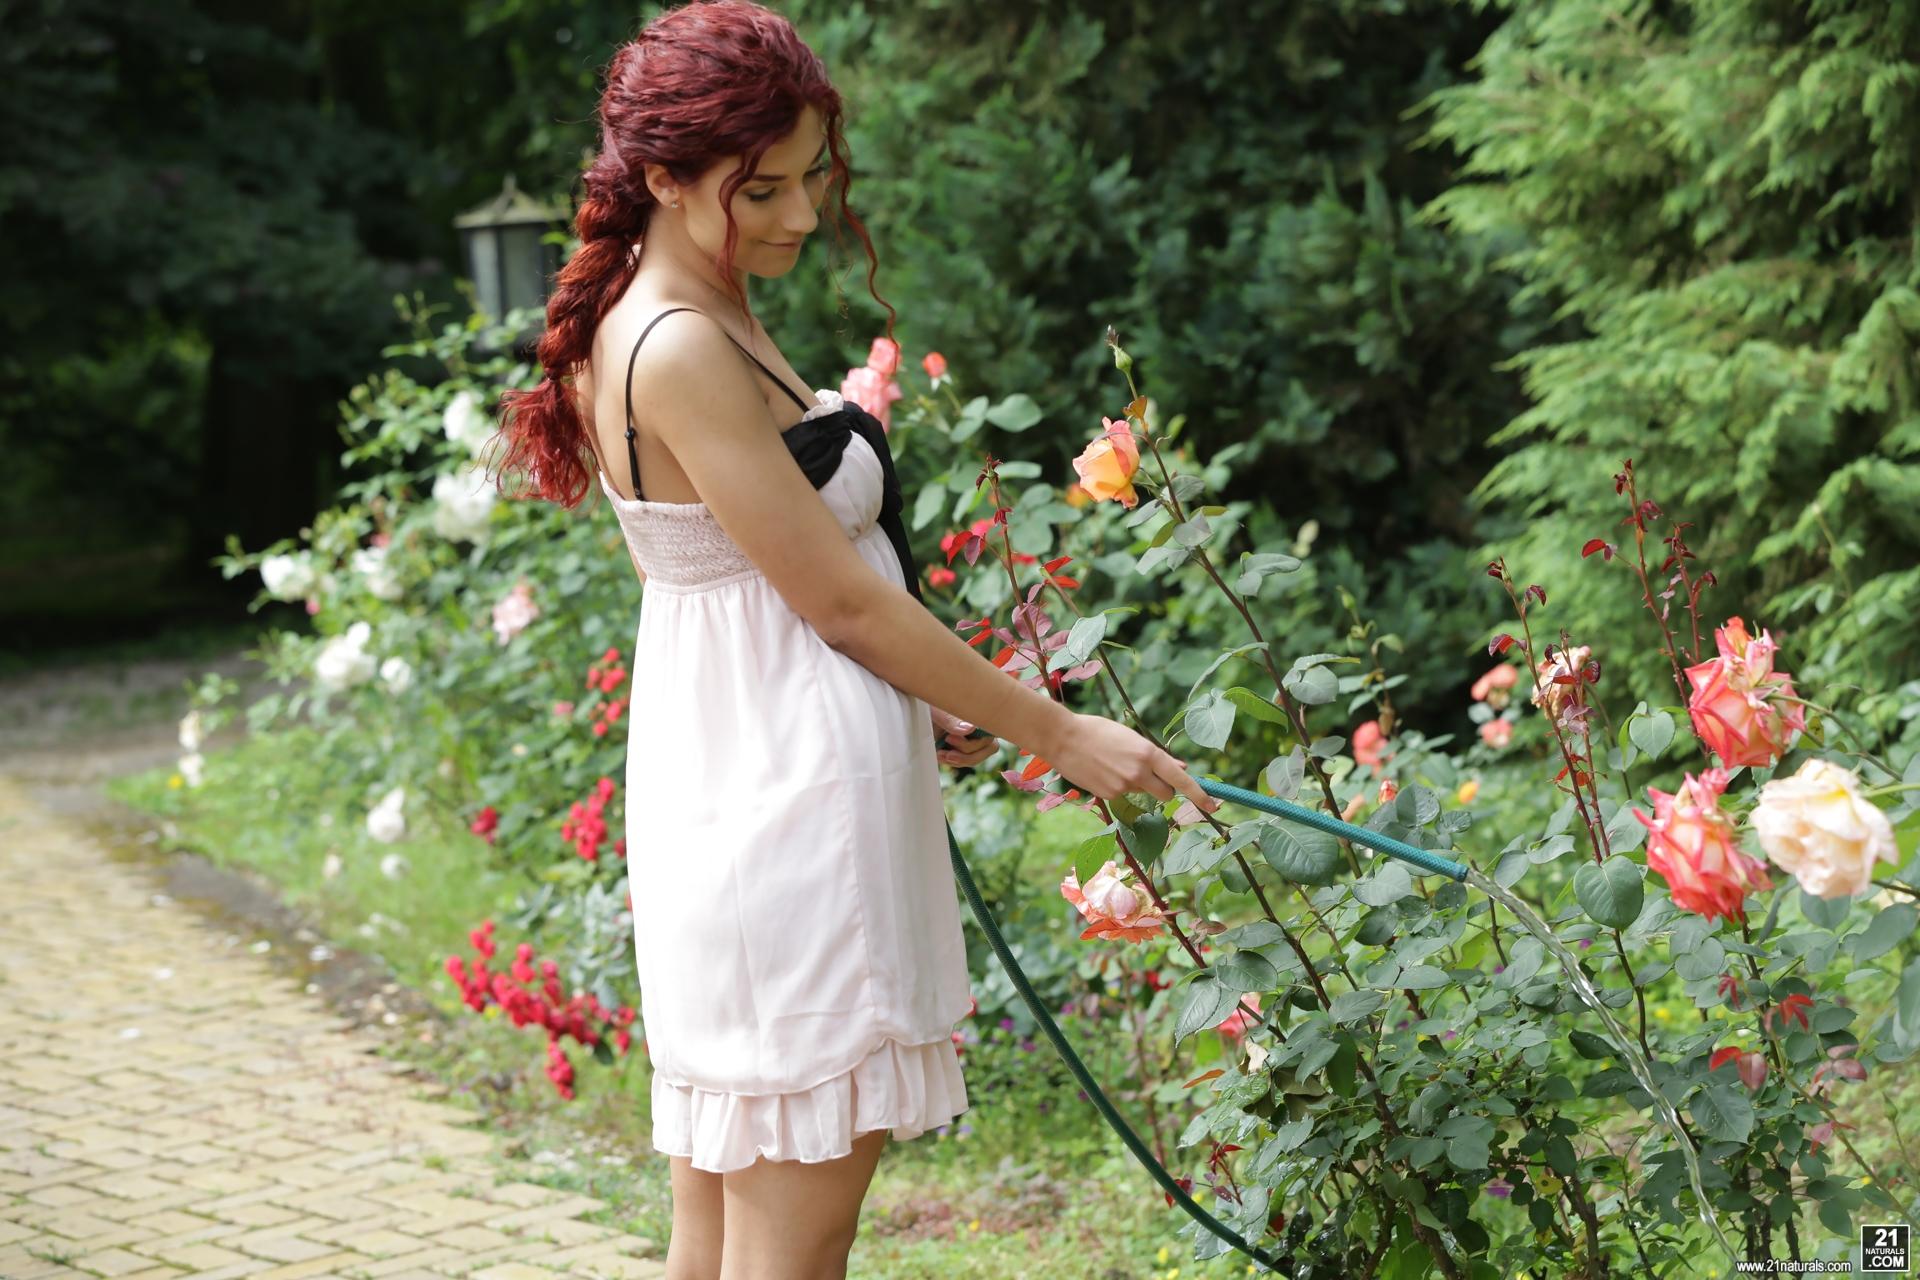 Shona River - el arte de chupar y coger al aire libre